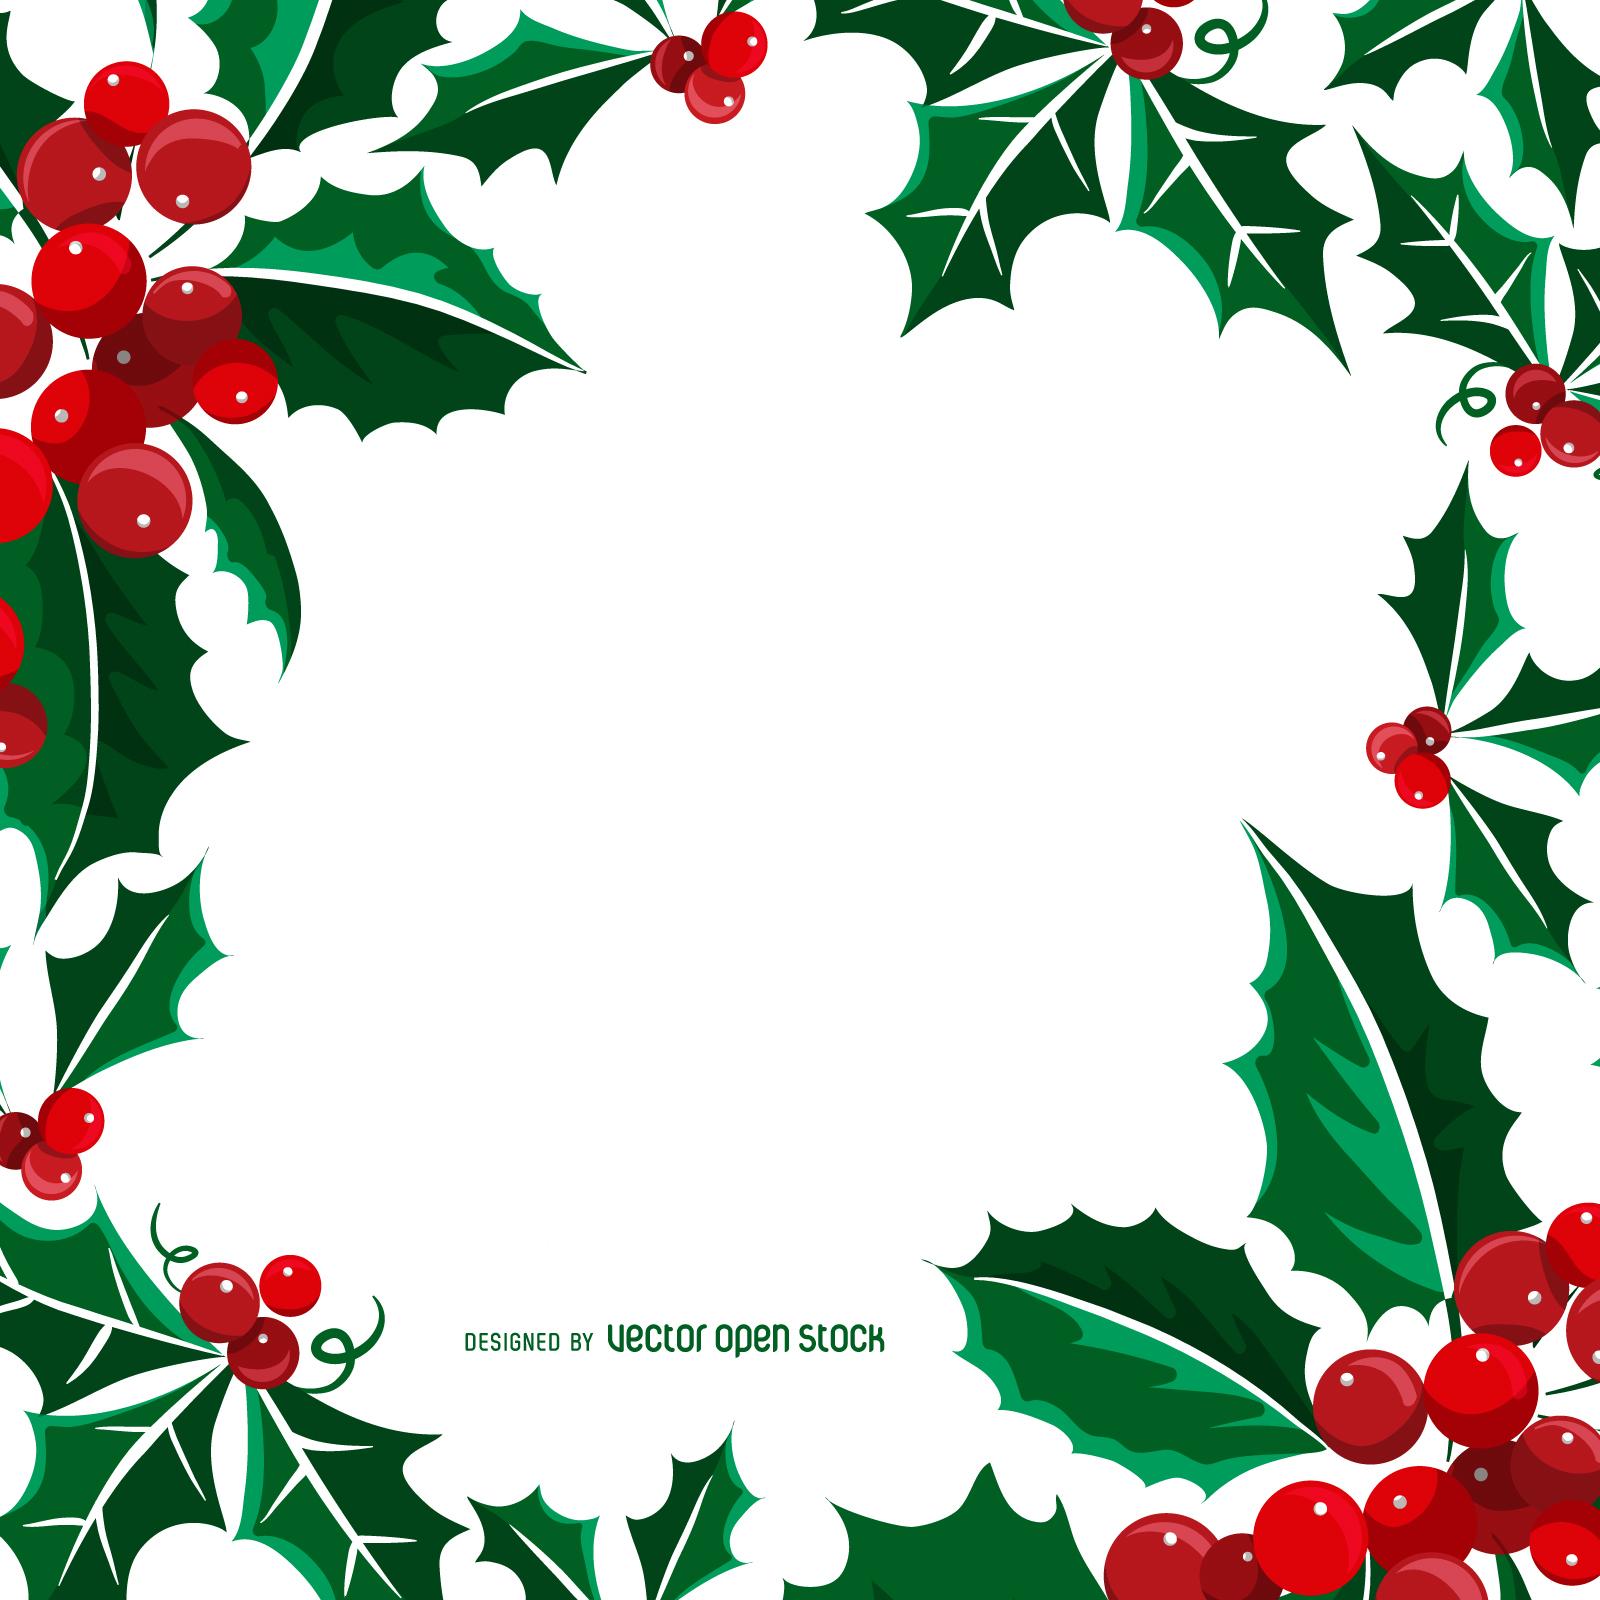 Square Christmas mistletoe frame - Vector download